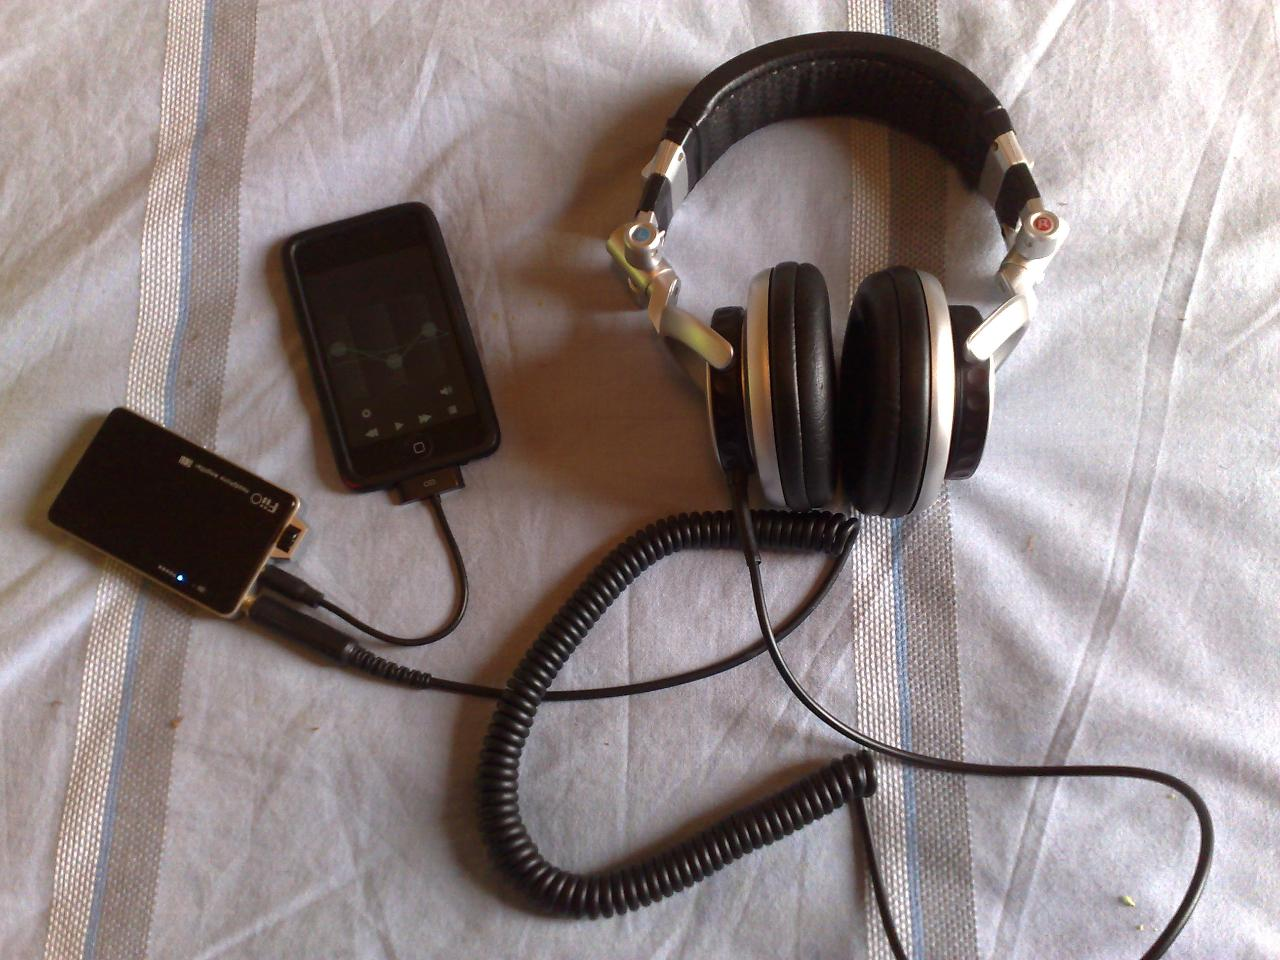 Headphone set up 1.jpg